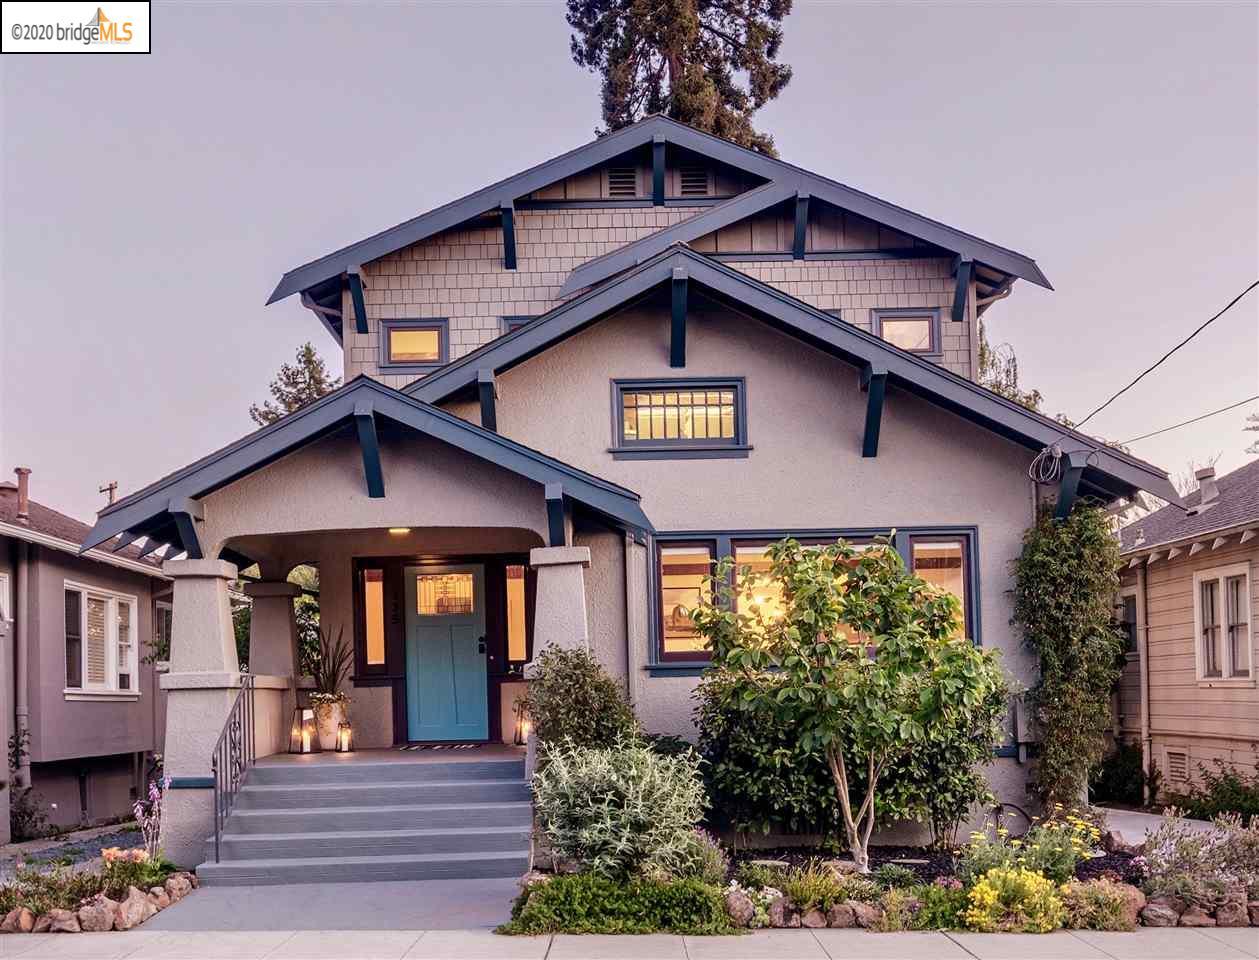 335 Clifton St Oakland, CA 94618